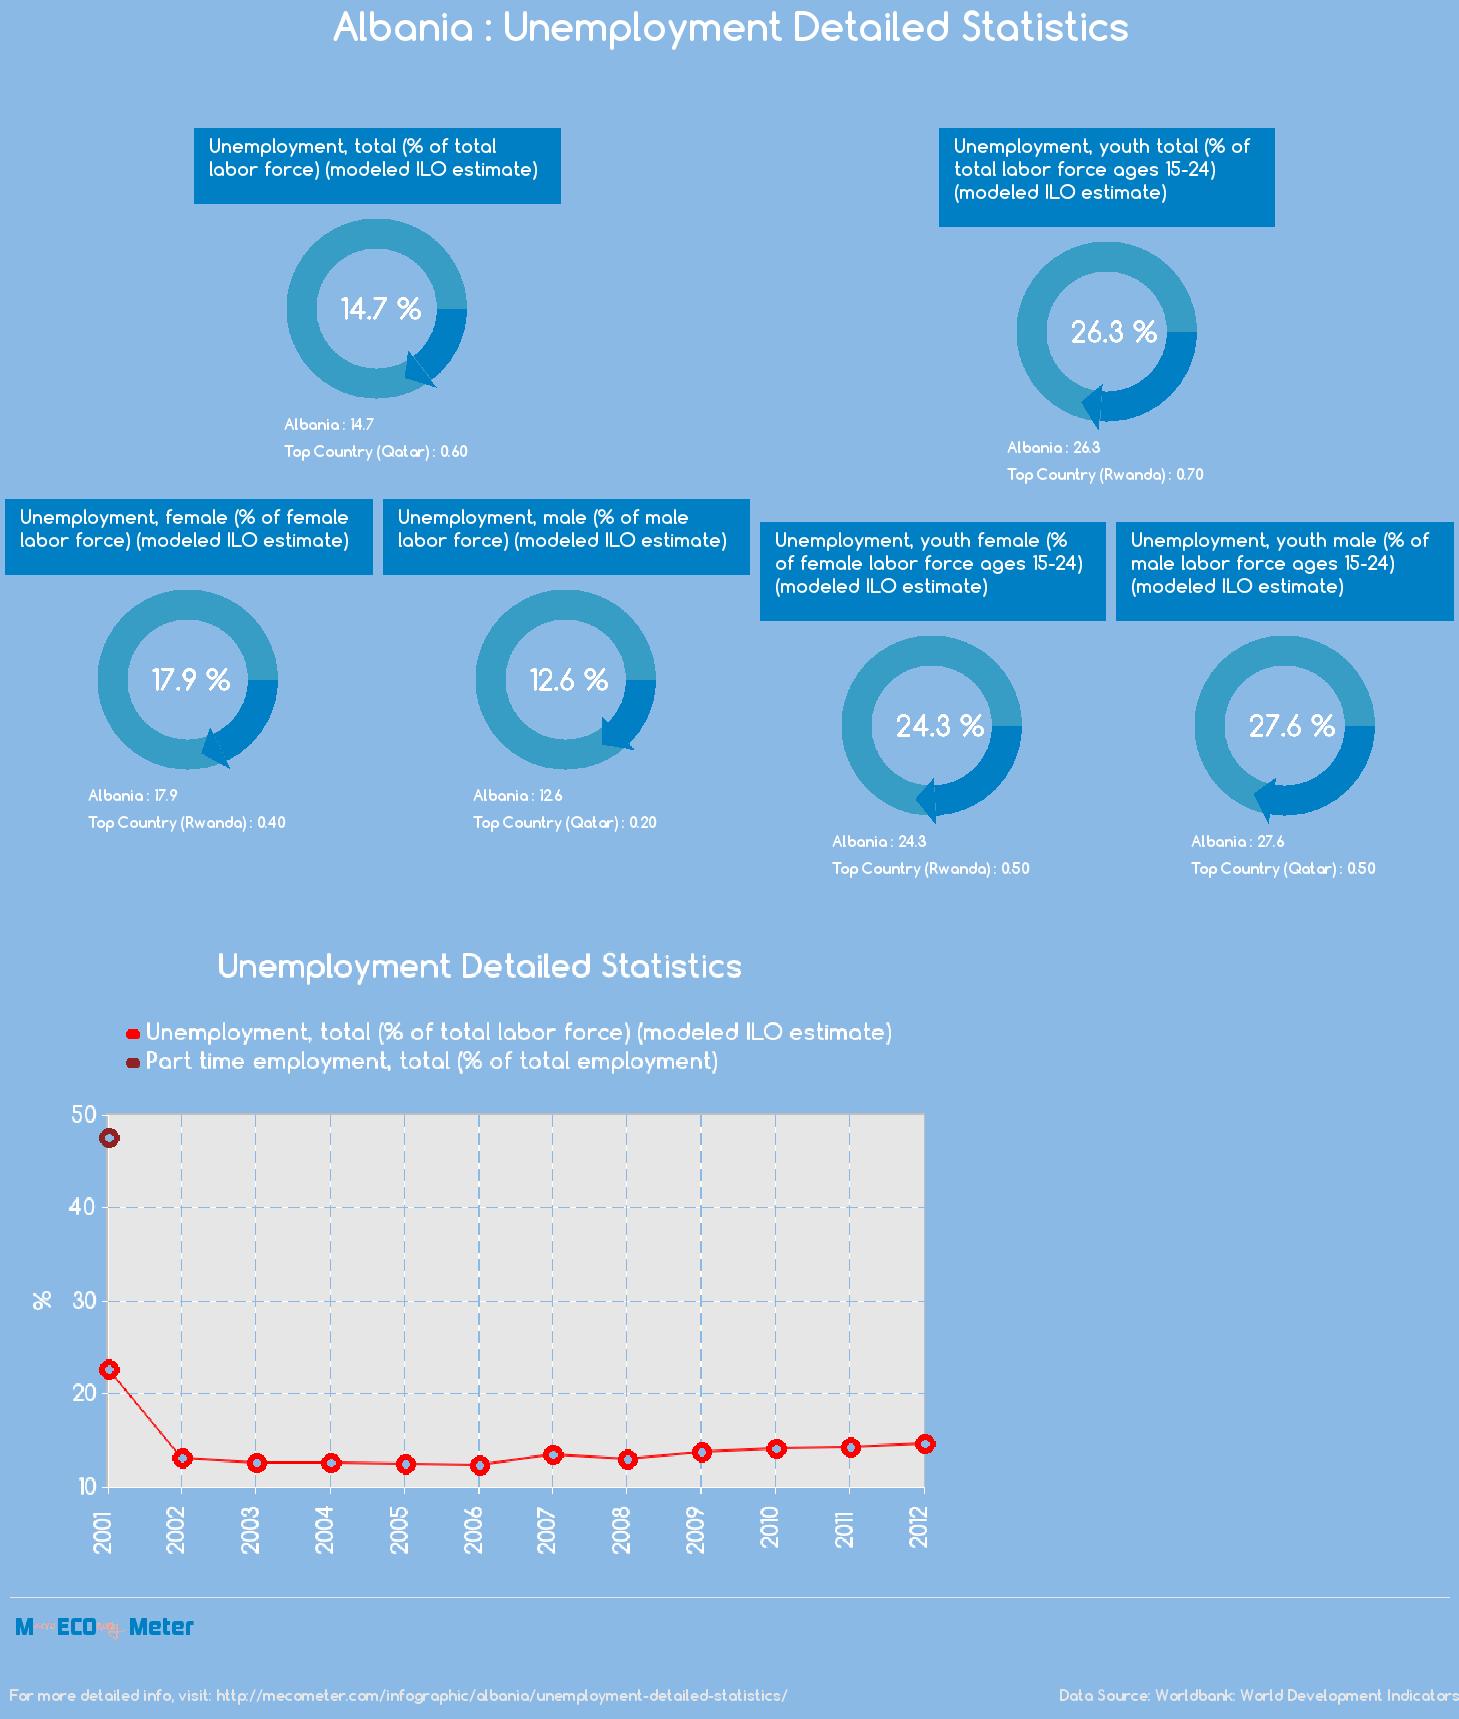 Albania : Unemployment Detailed Statistics